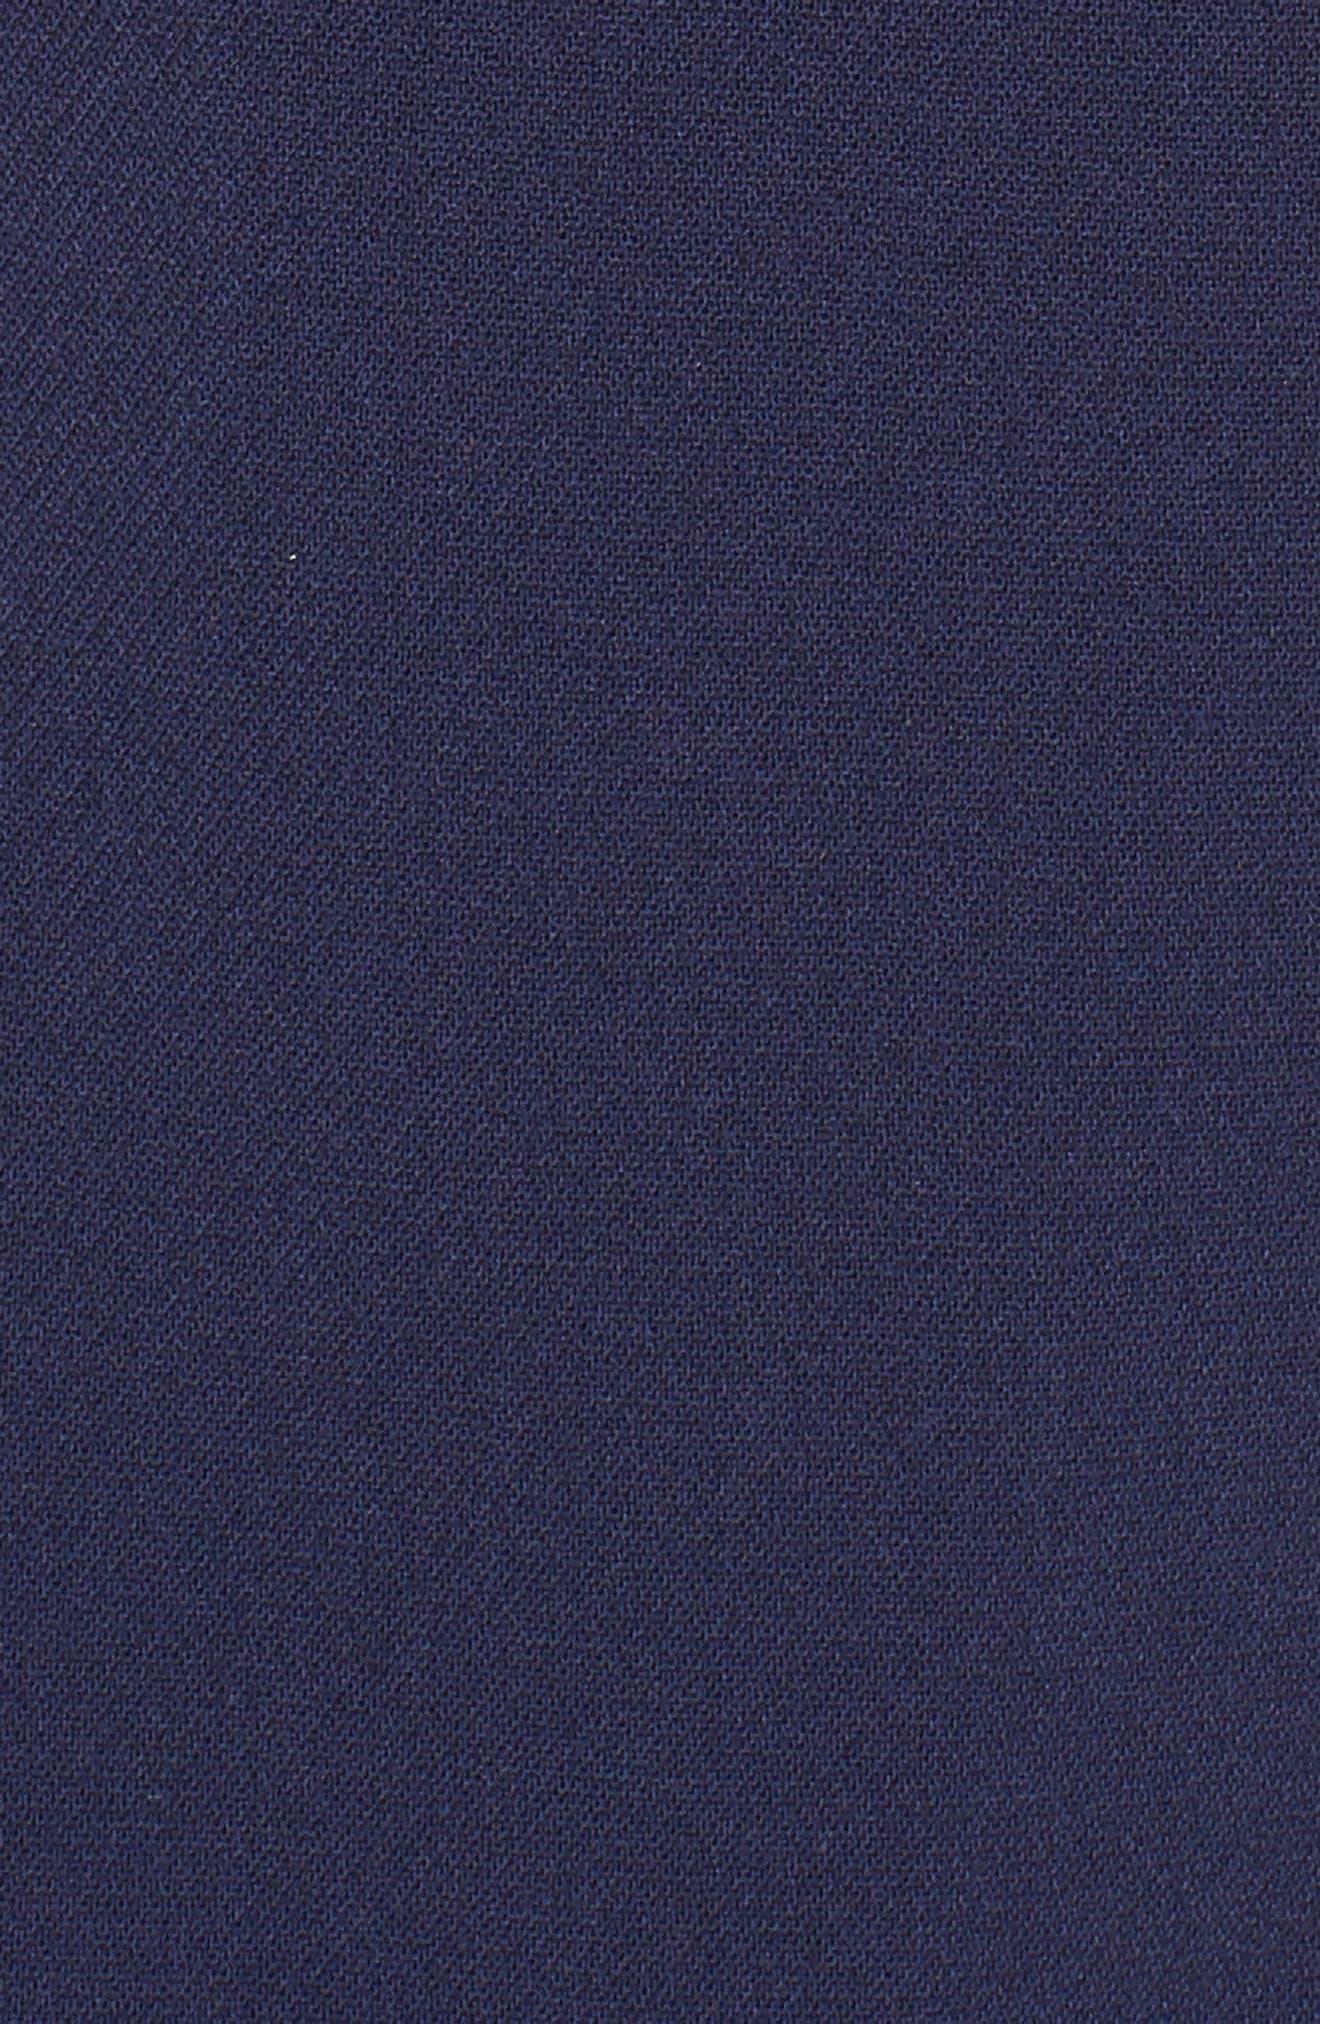 Puff Shoulder Blazer,                             Alternate thumbnail 6, color,                             410